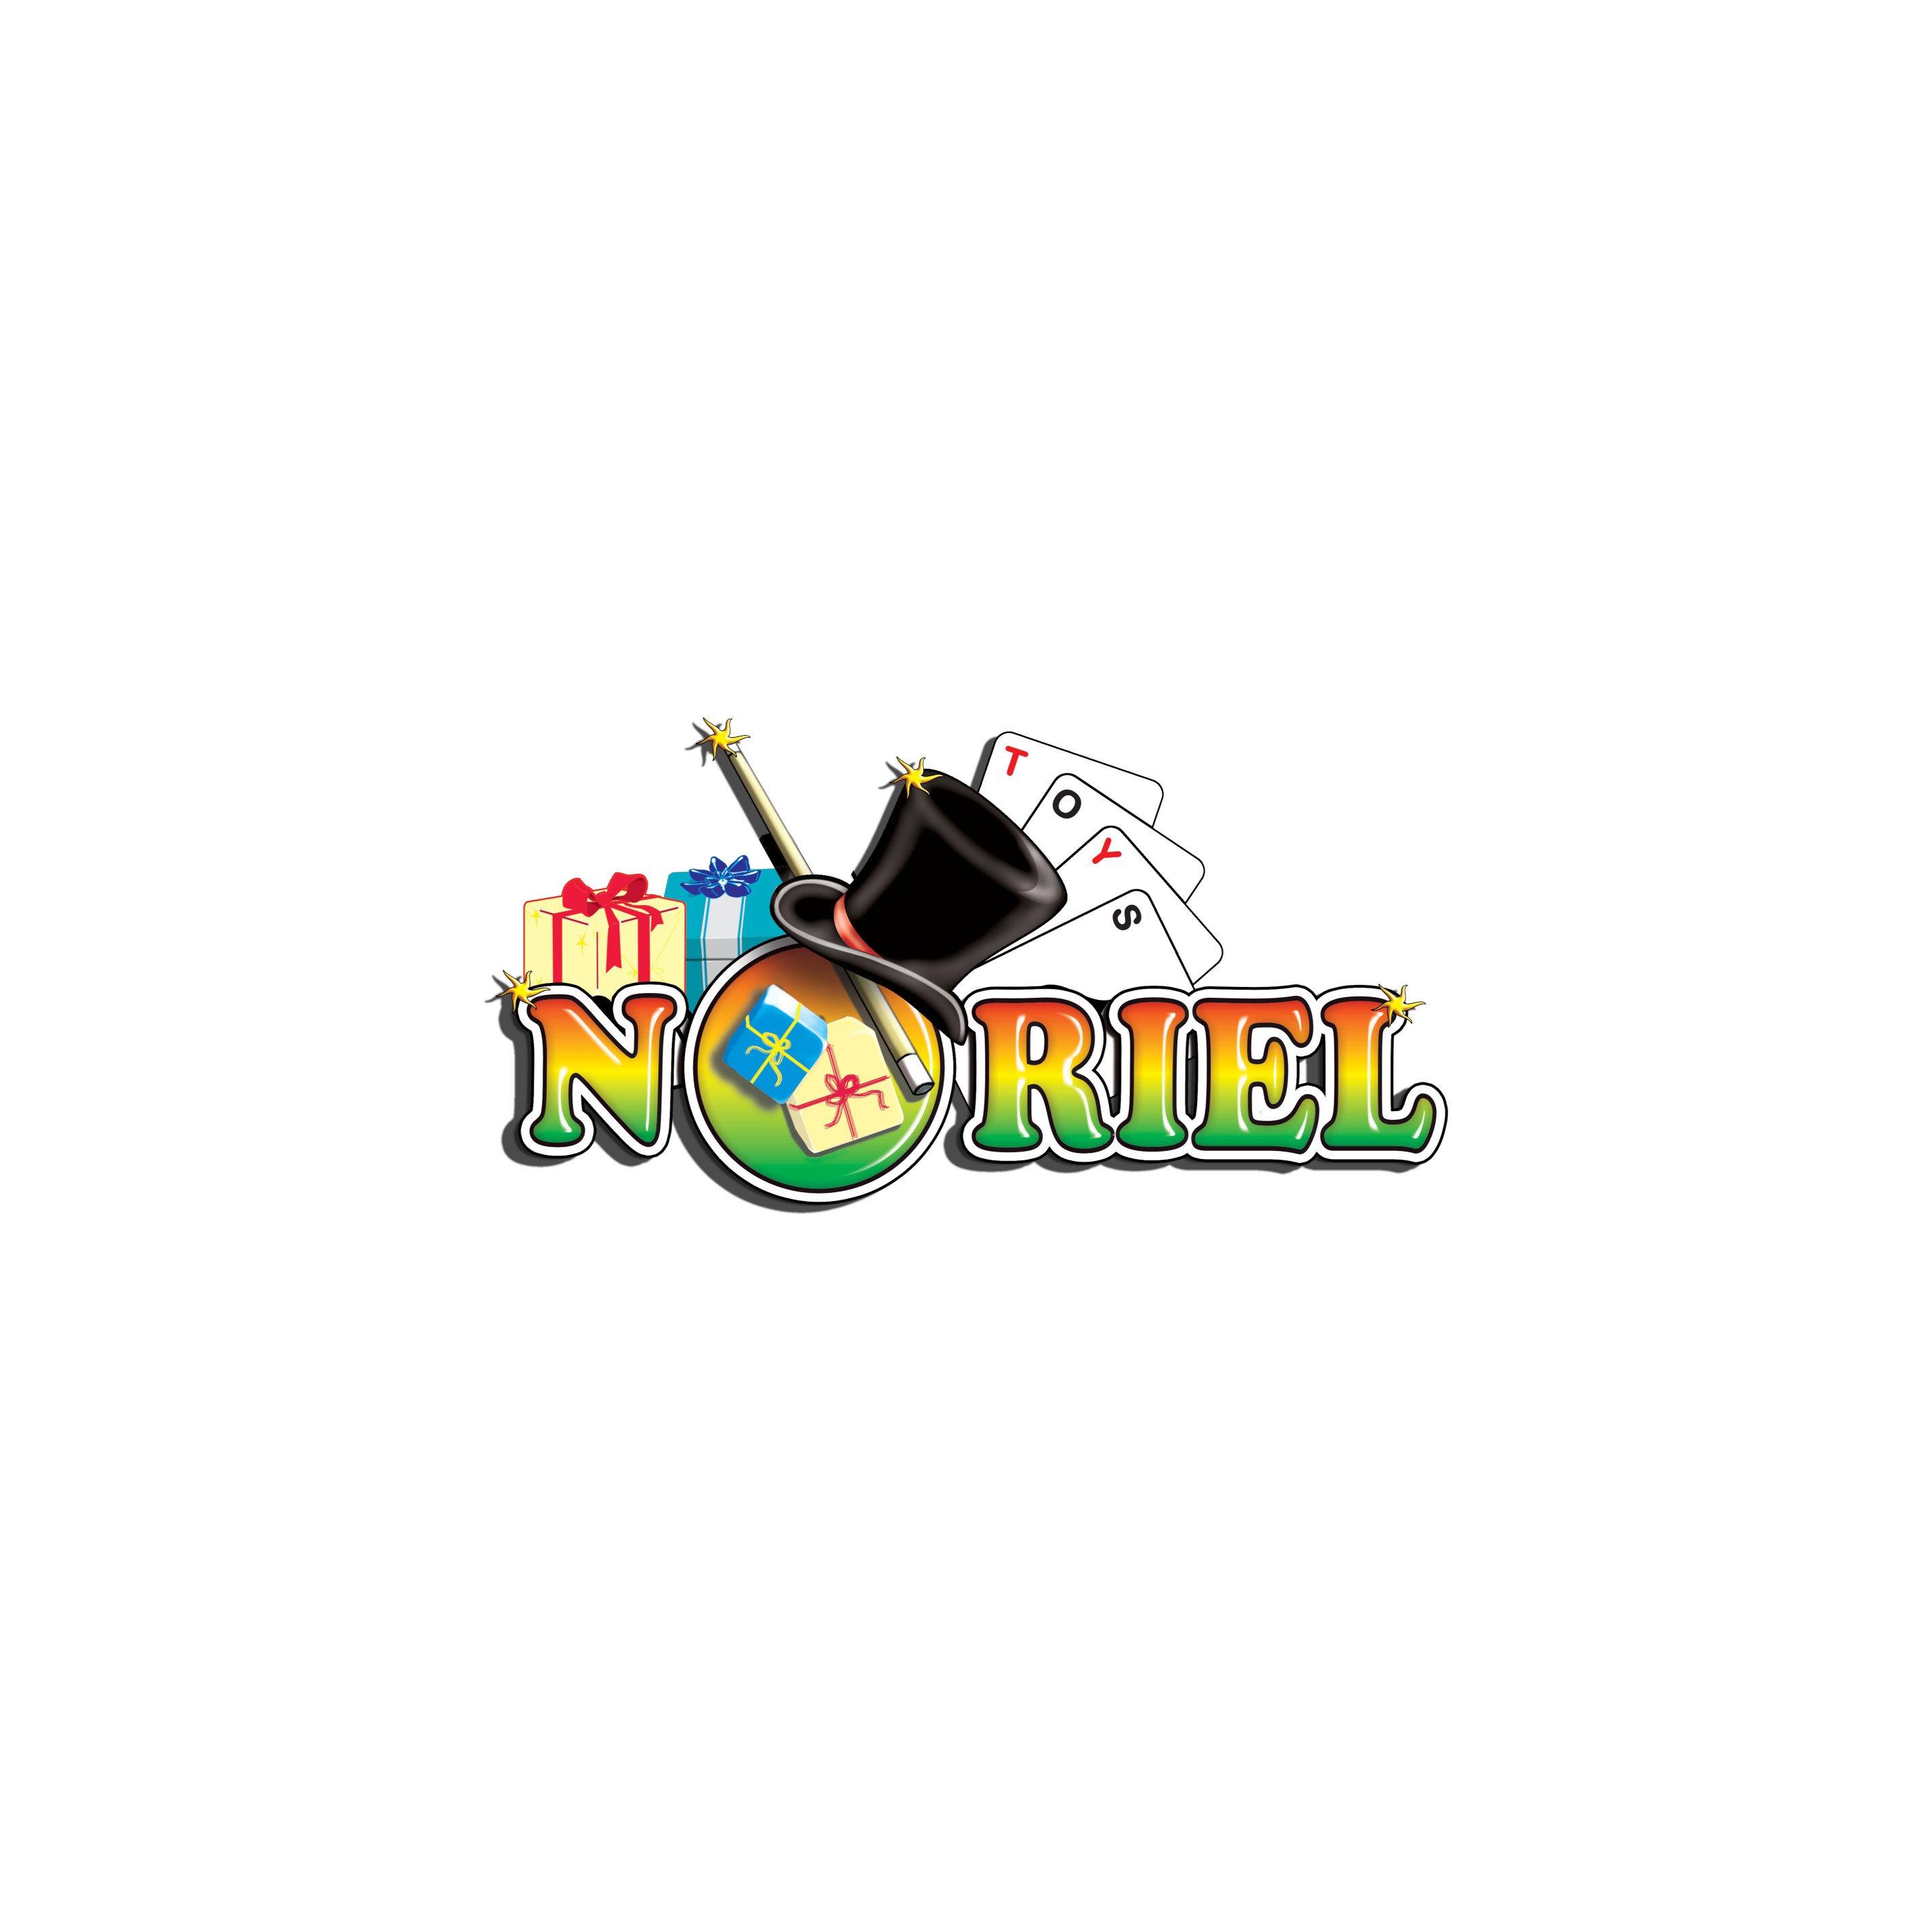 Figurina Transformers Playskool Heroes Rescue Bots - Valor The Lion B4954_005w